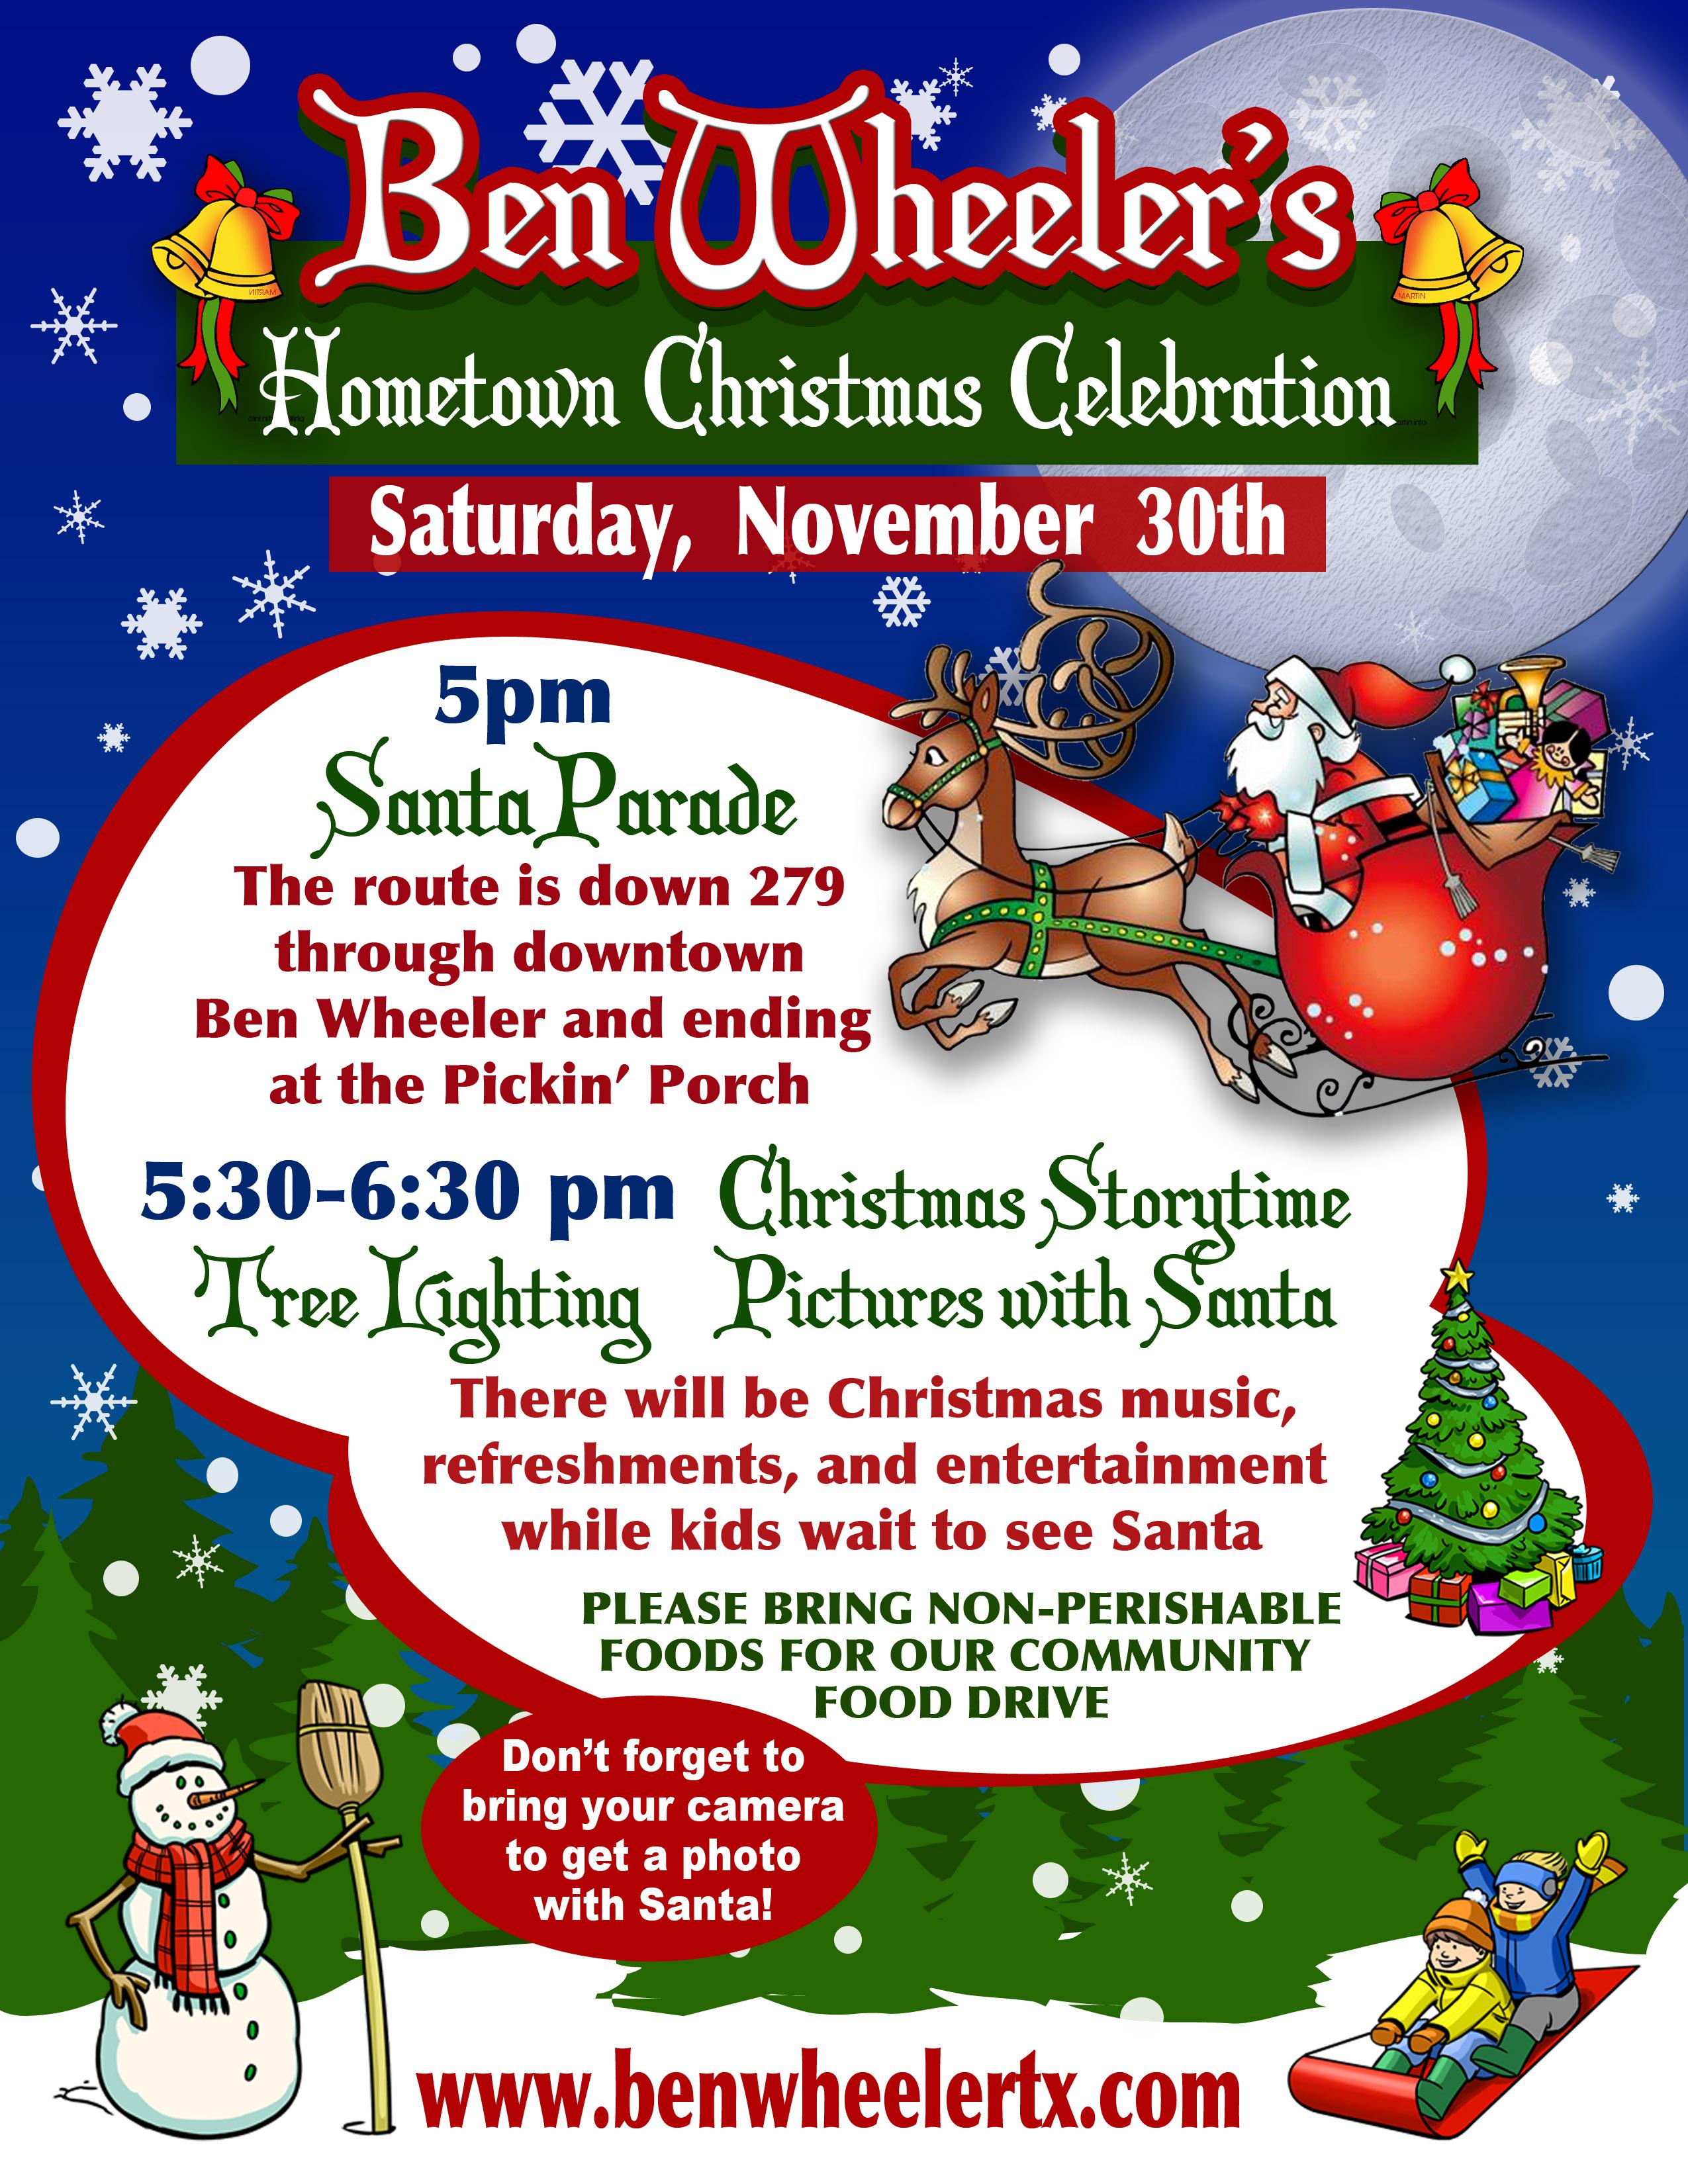 Ben Wheeler's Hometown Christmas Celebration – The Forge Bar and Grill, Ben Wheeler, TX